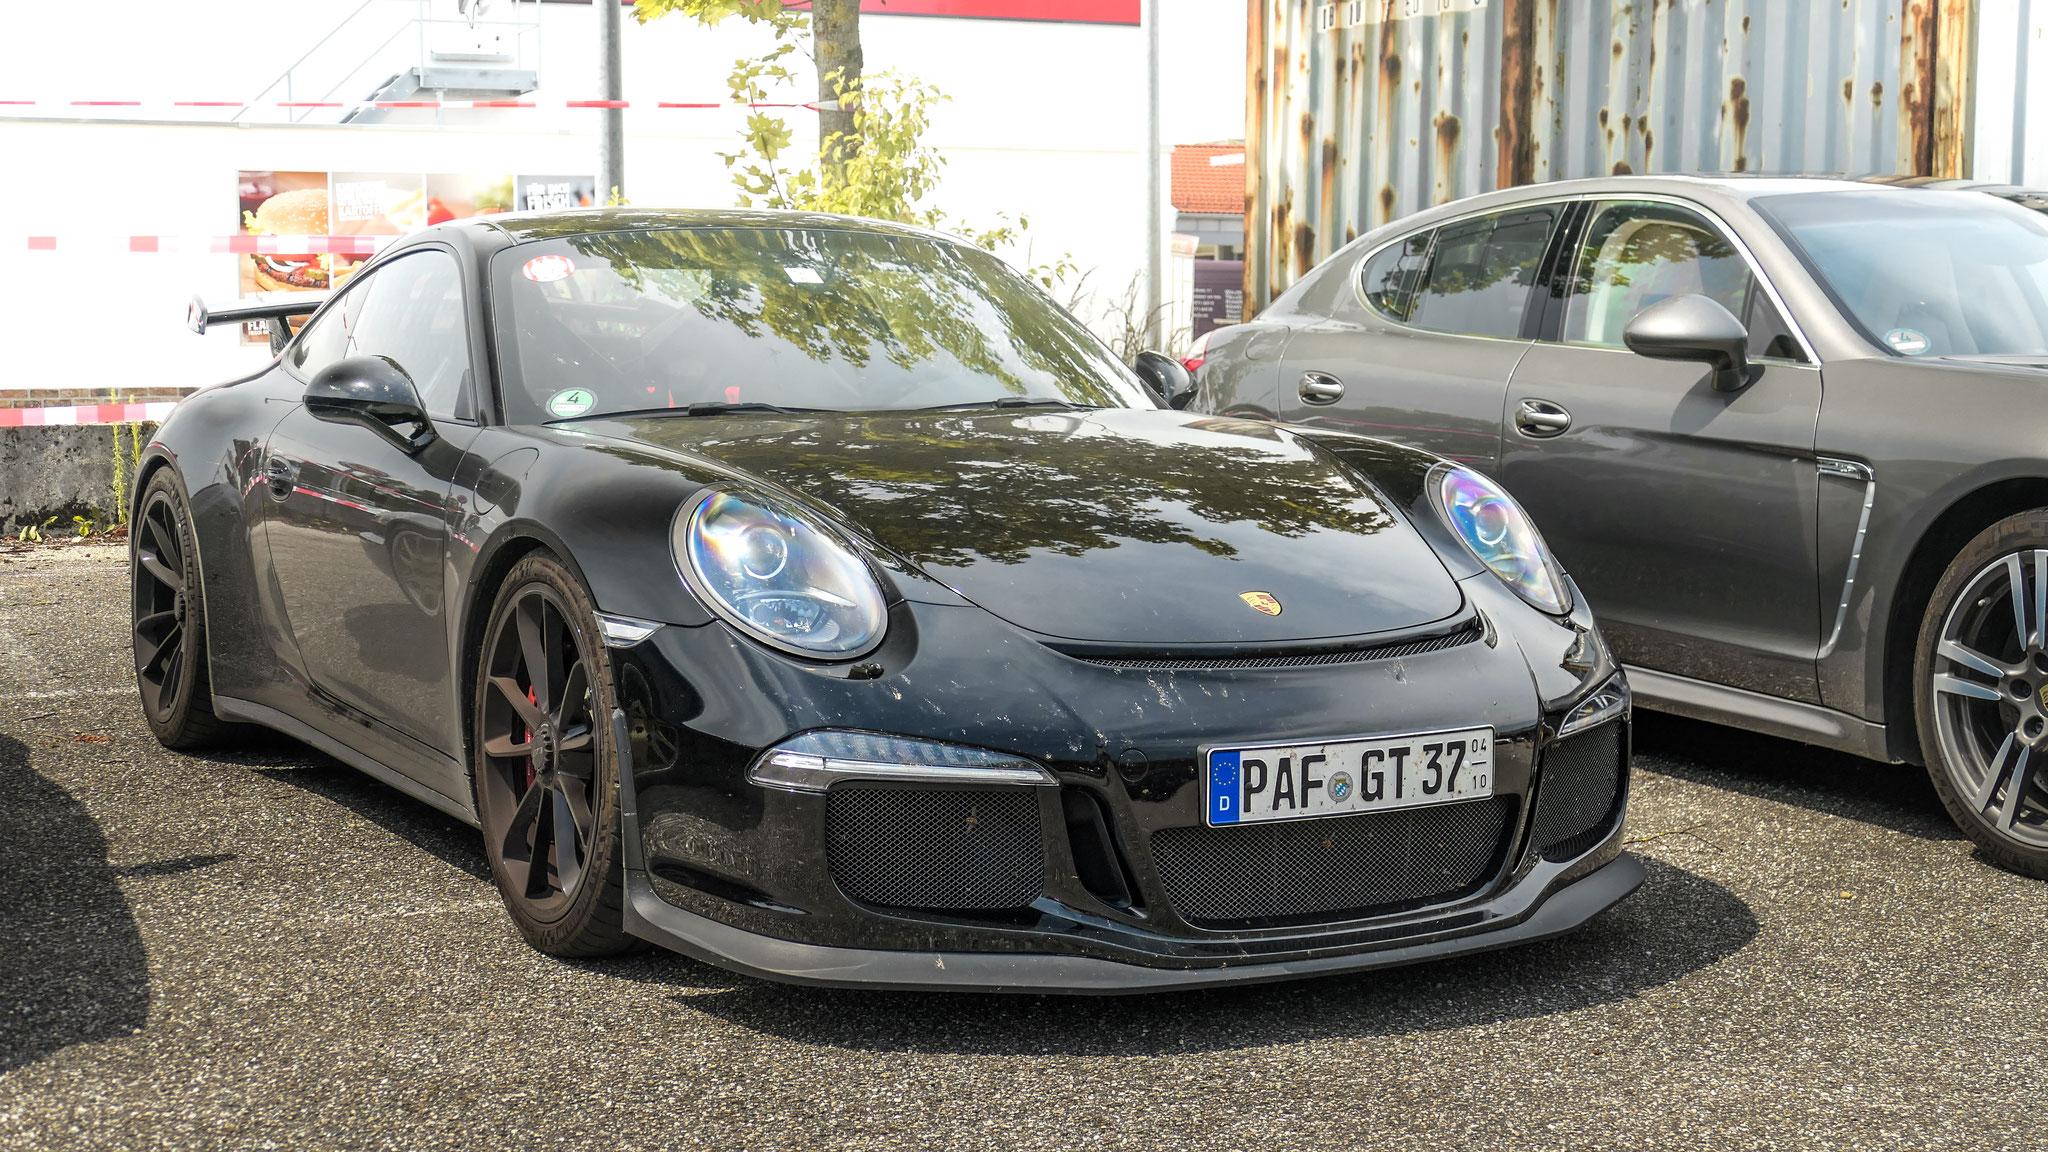 Porsche 991 GT3 - PAF-GT-37